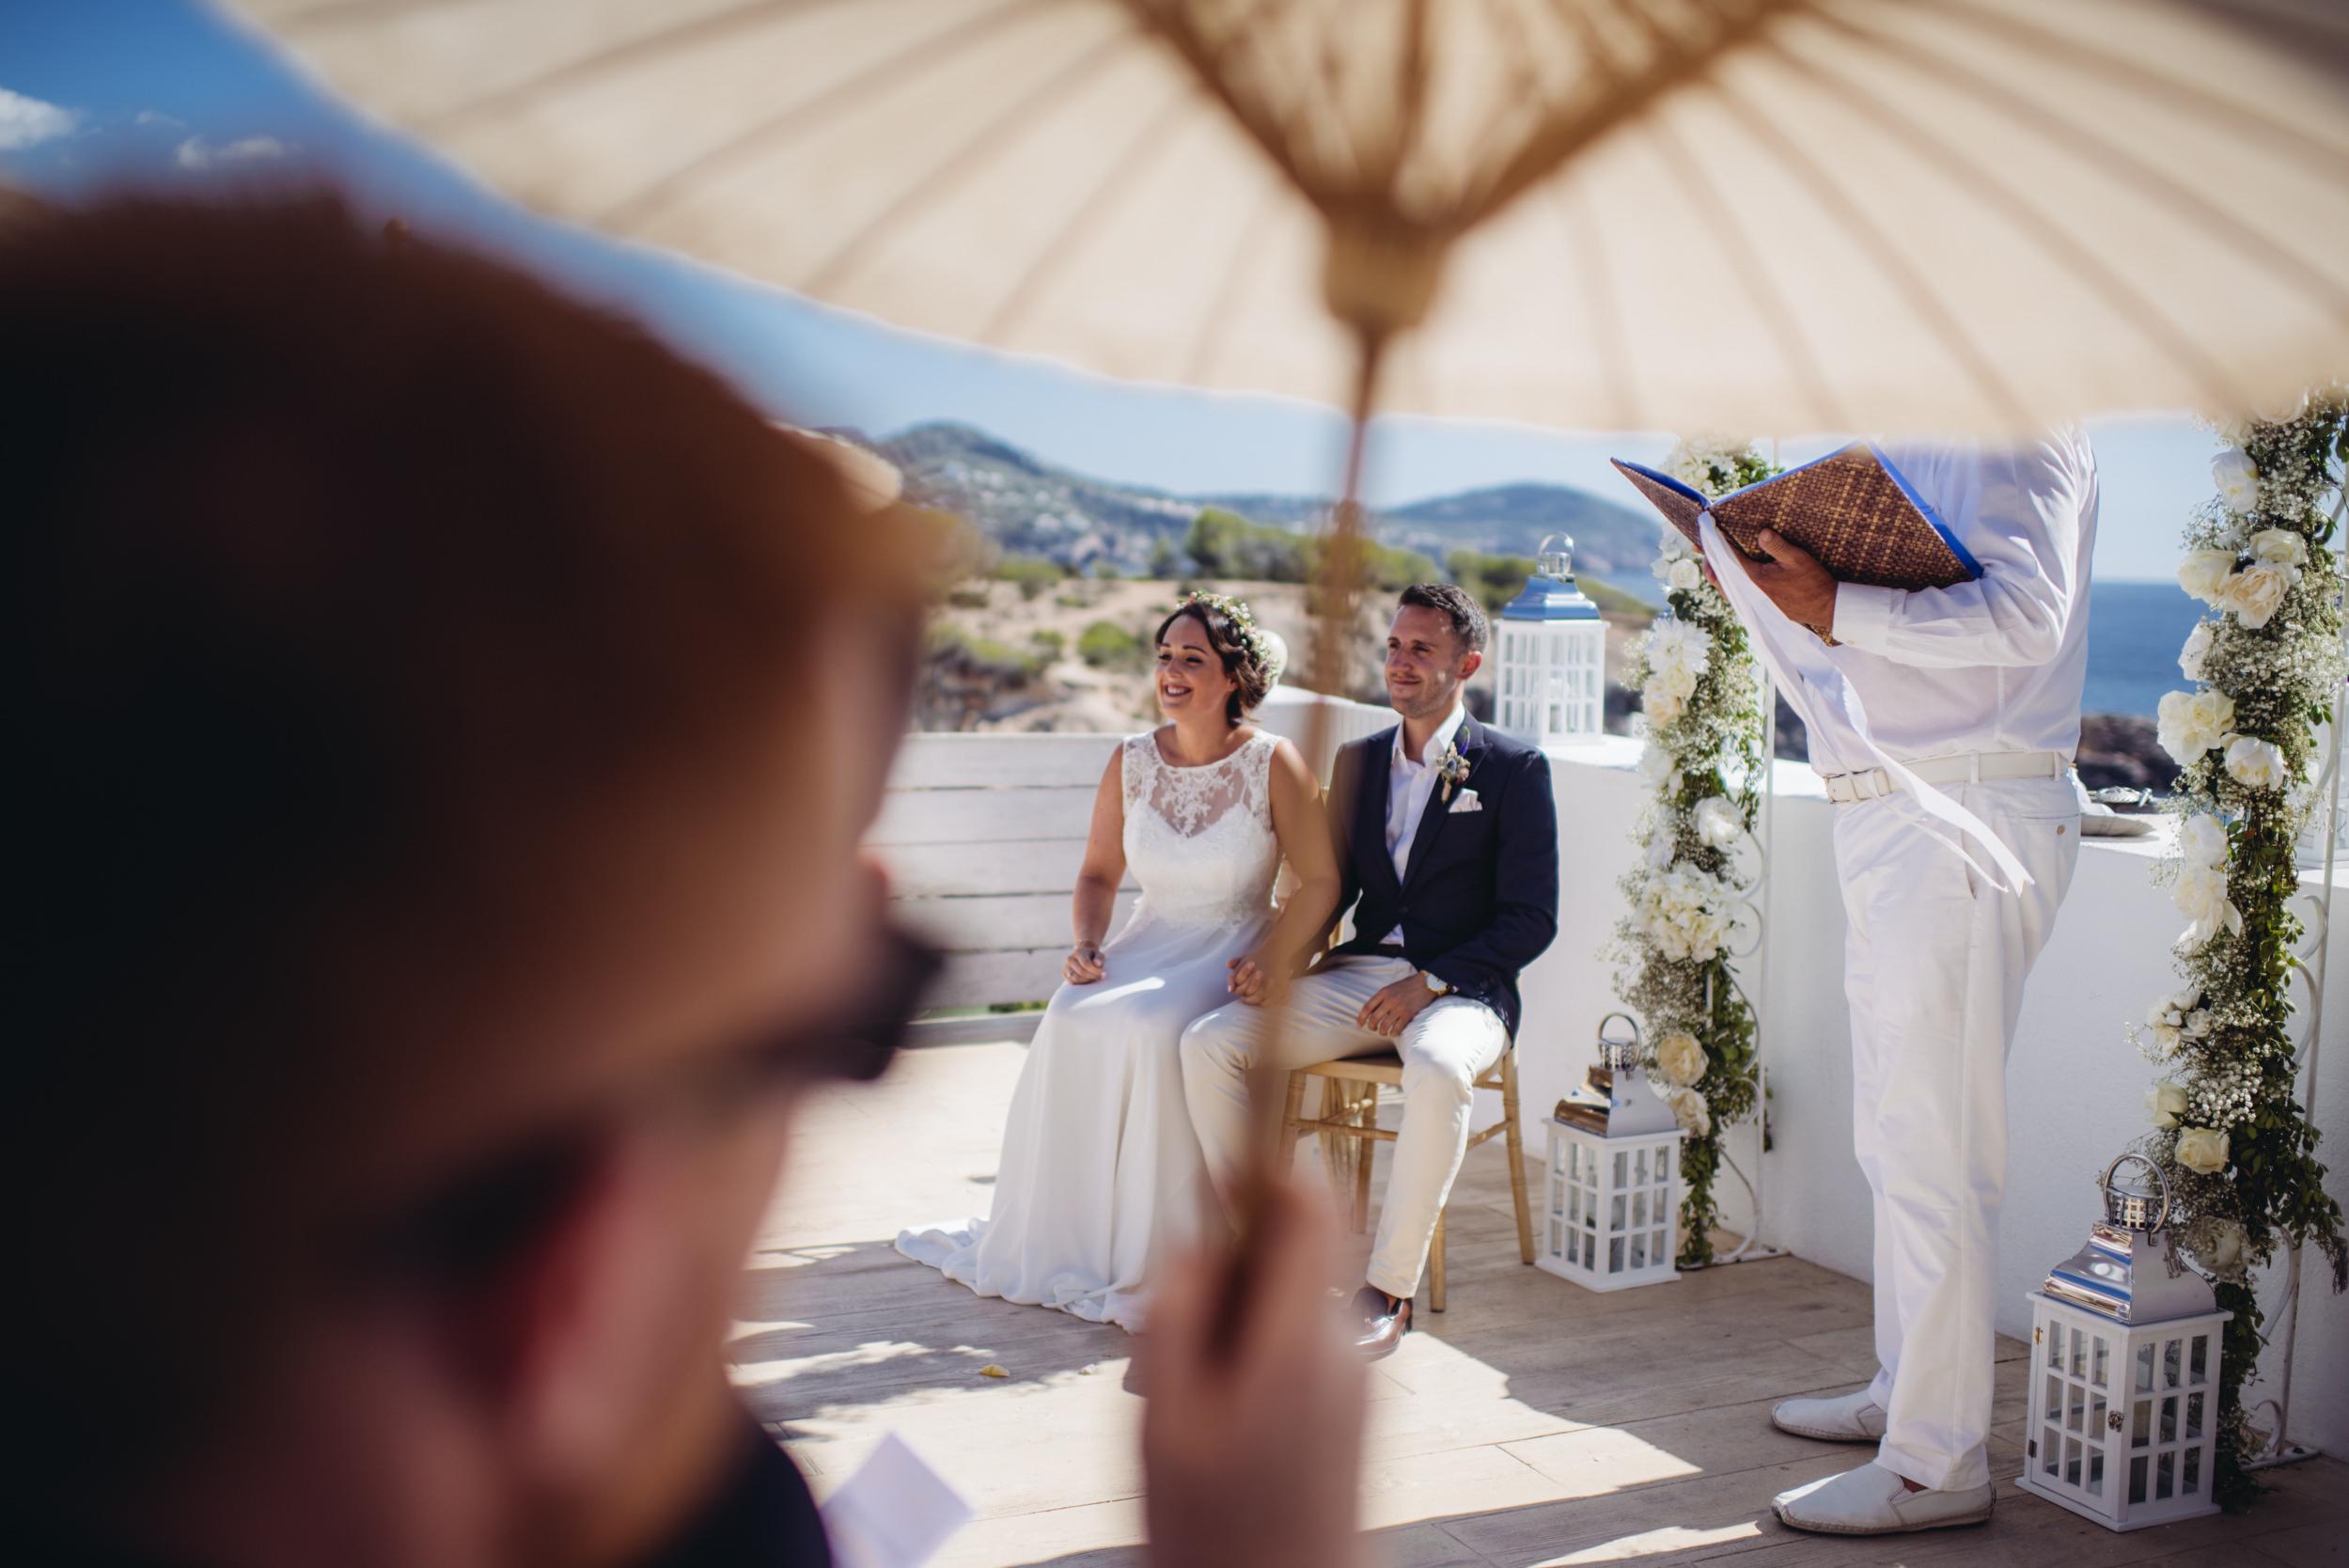 0123-alternative-wedding-portrait-family-kids-photographer-glasgow-scotland.JPG